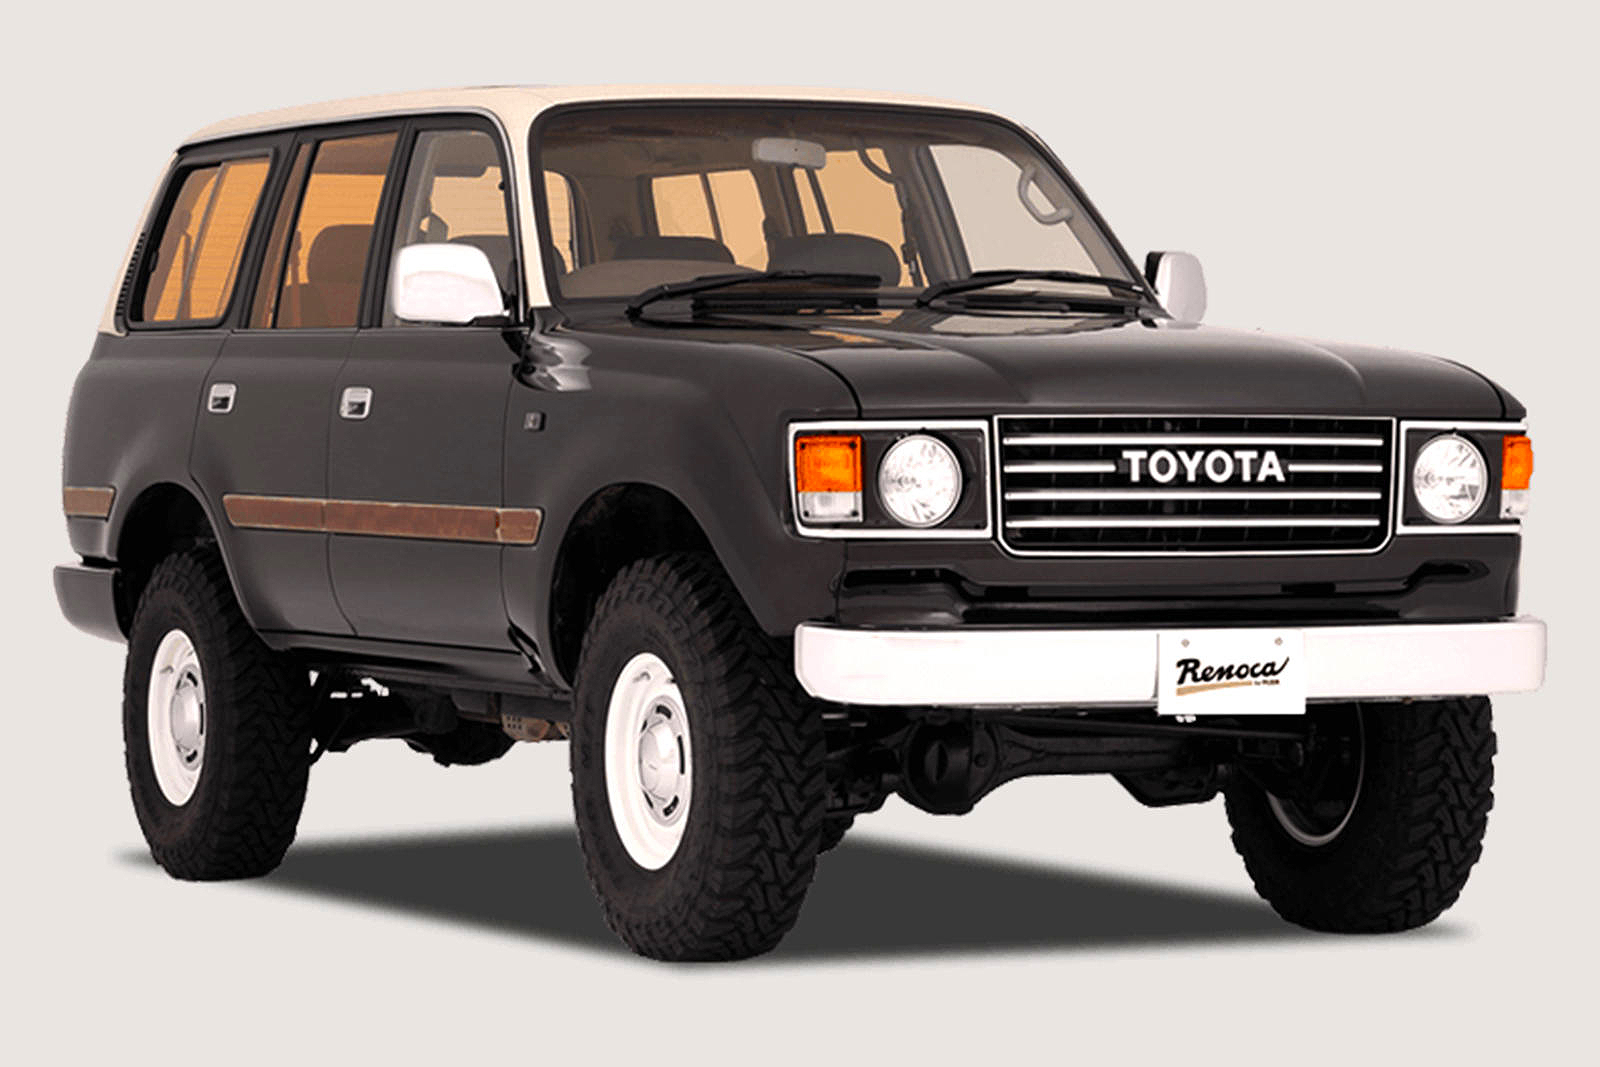 Renoca Toyota restomodok